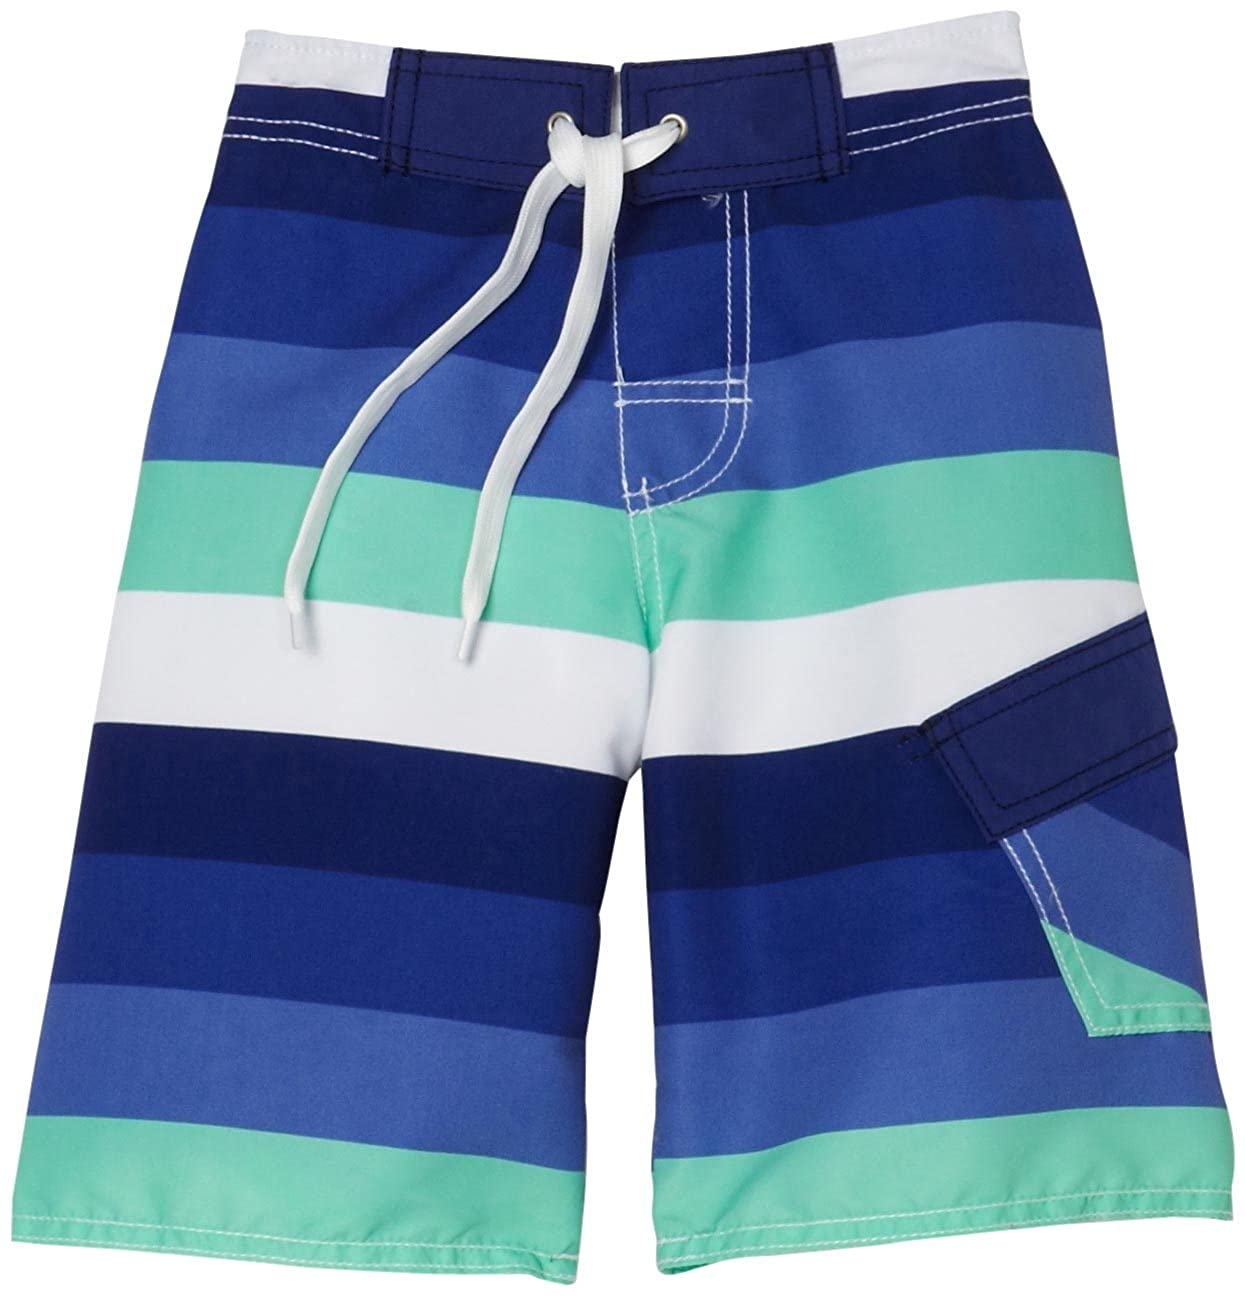 1f207a215d Charlie Rocket Little Boys' Sunset Stripe Swim Short, Sunset, 7: Amazon.in:  Clothing & Accessories